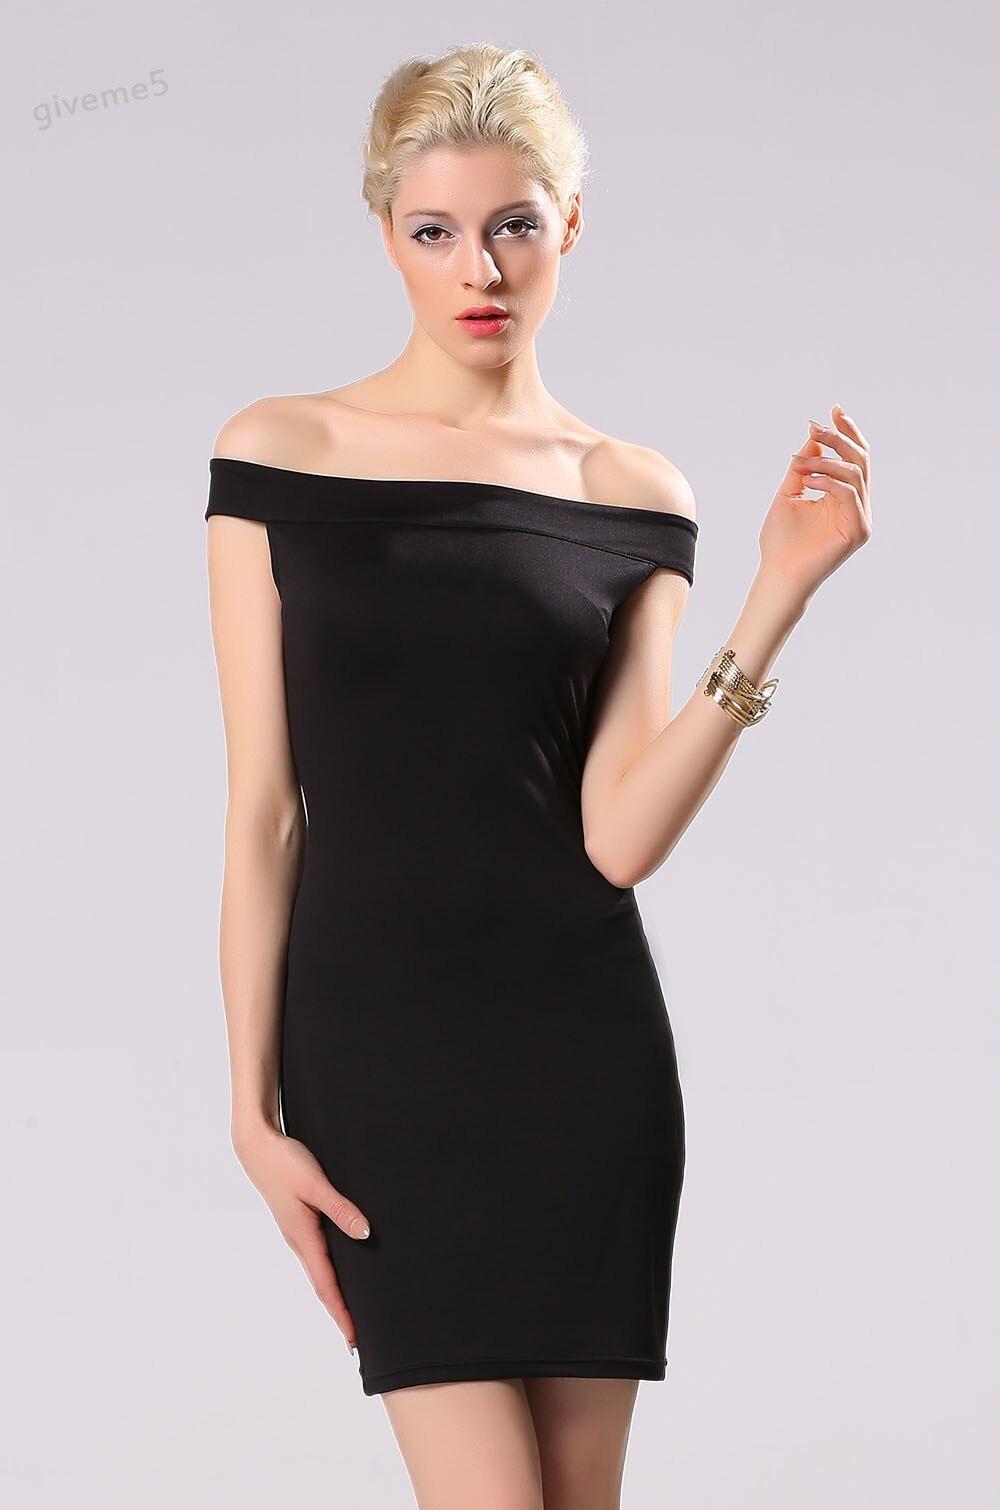 Party Dresses Size 22 Promotion-Shop for Promotional Party Dresses ...